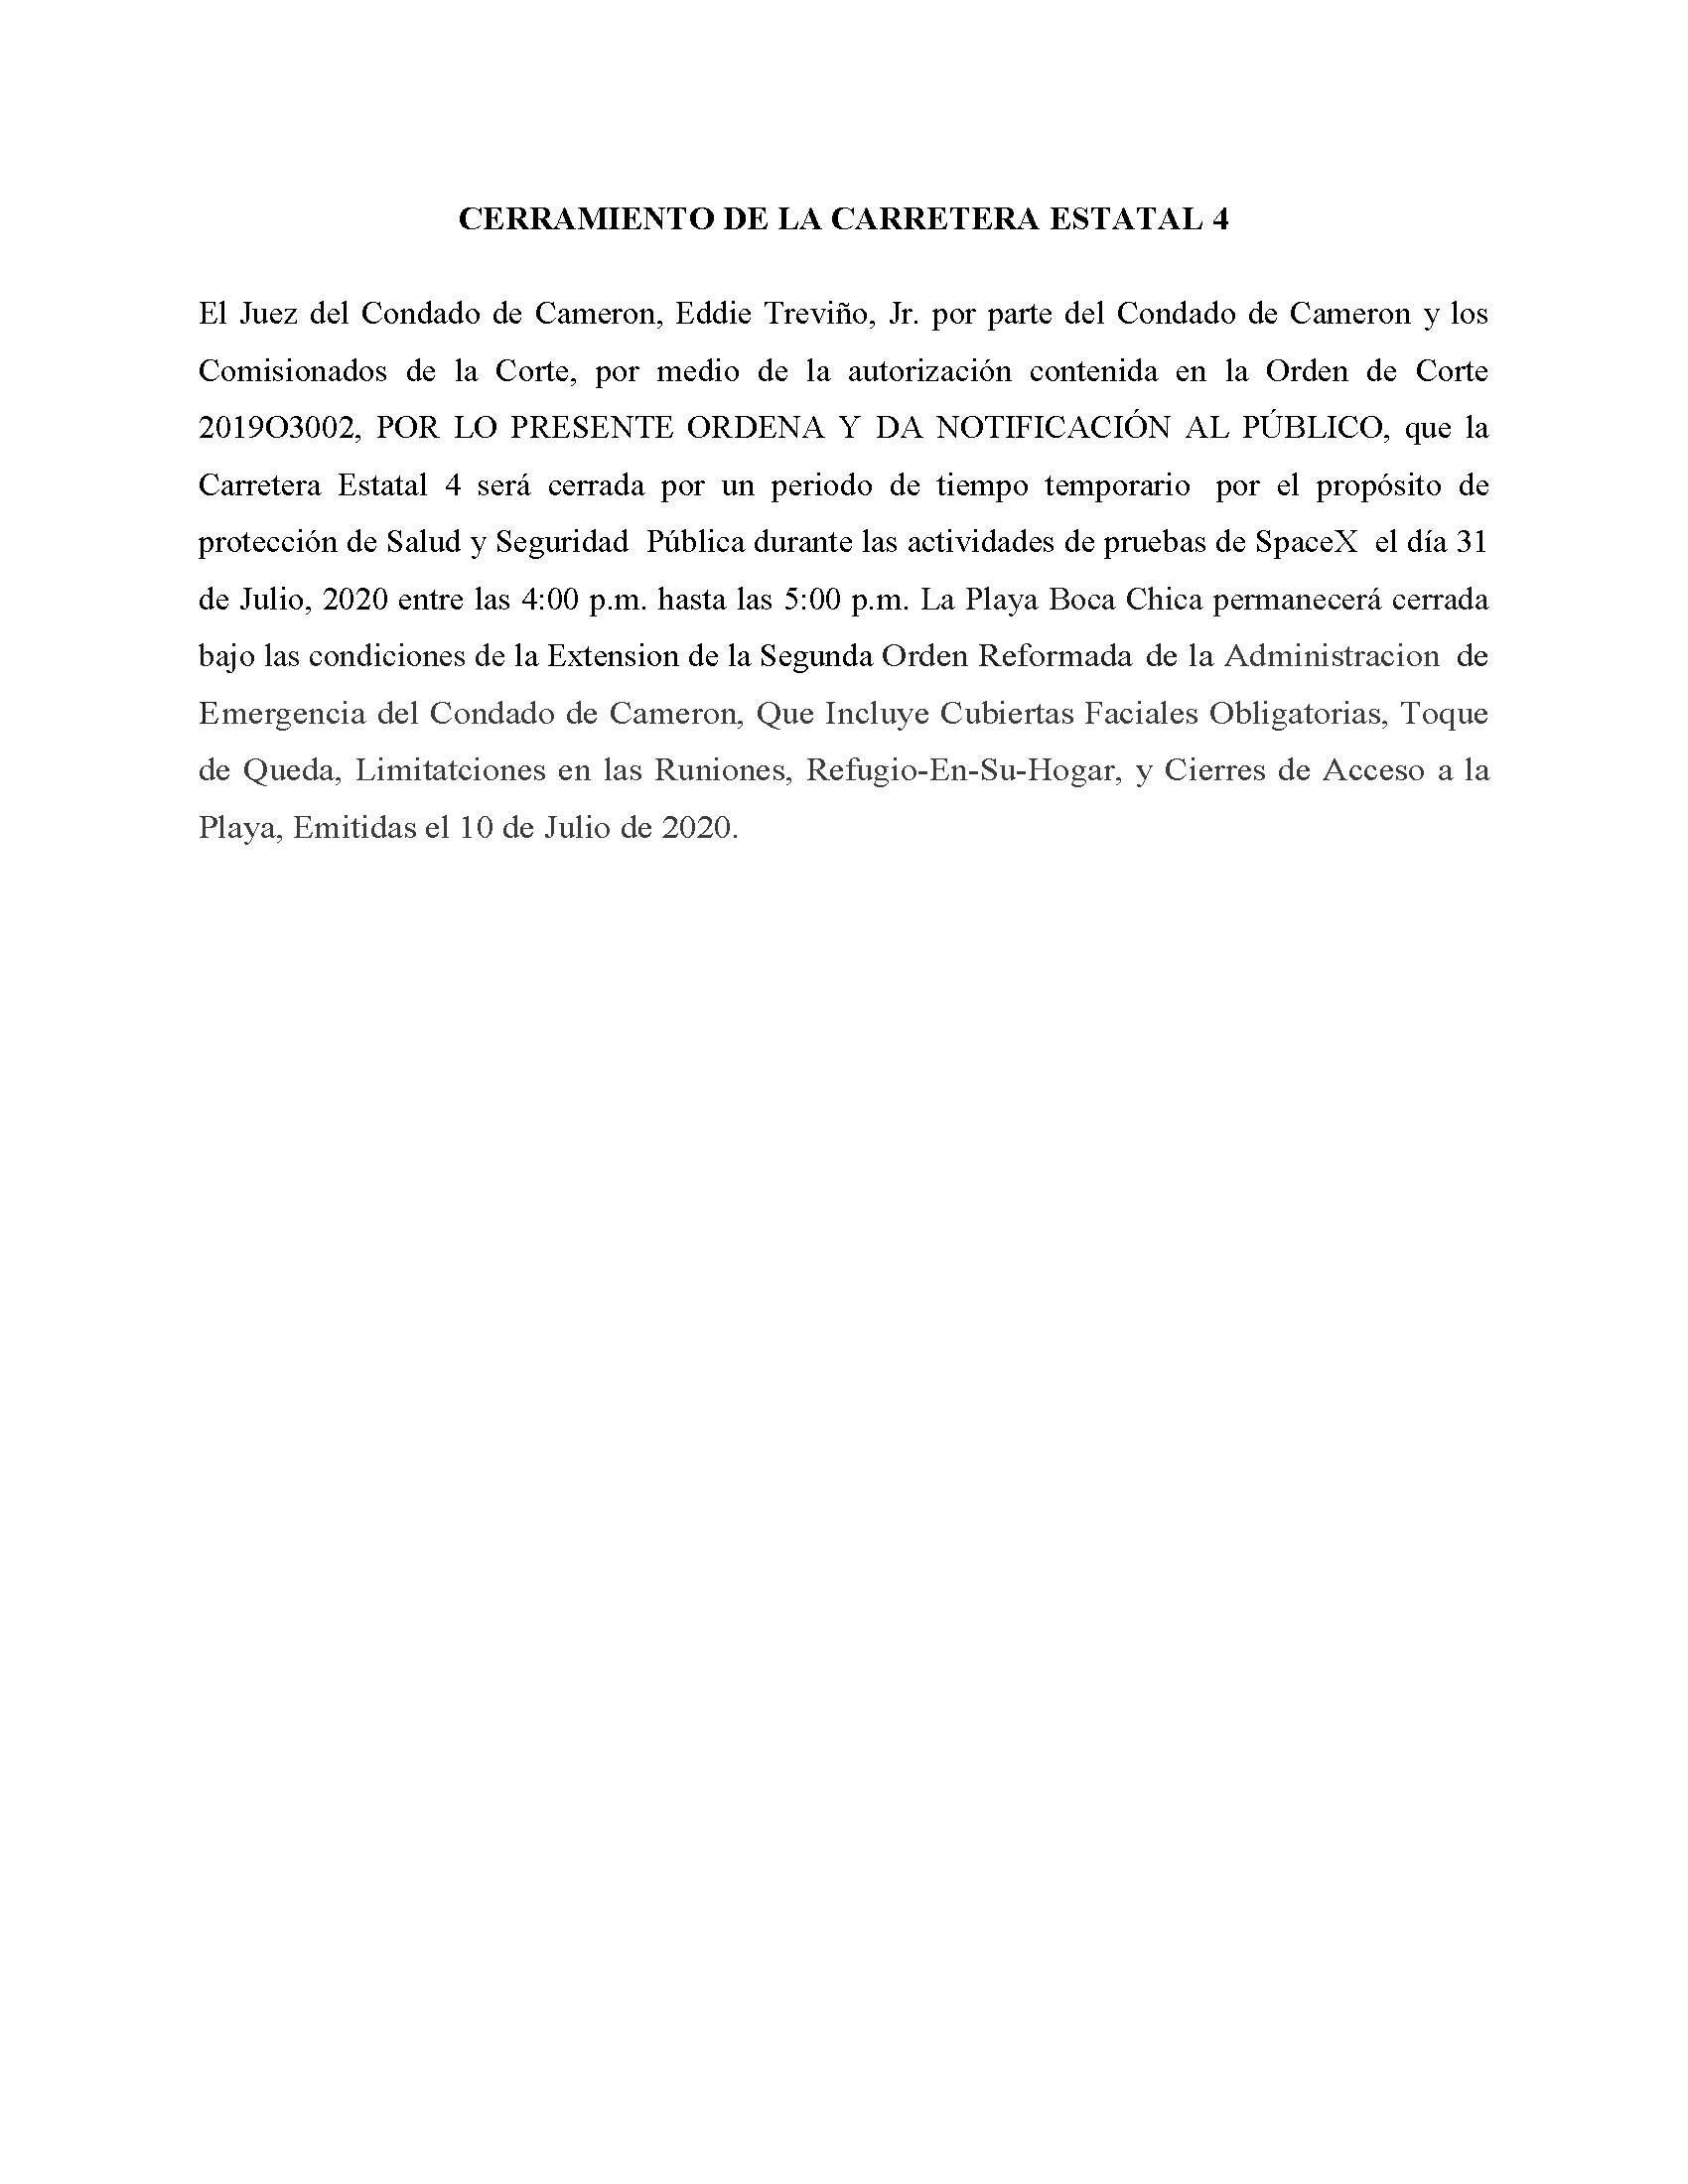 ORDER.CLOSURE OF HIGHWAY 4.SPANISH.07.31.20 1